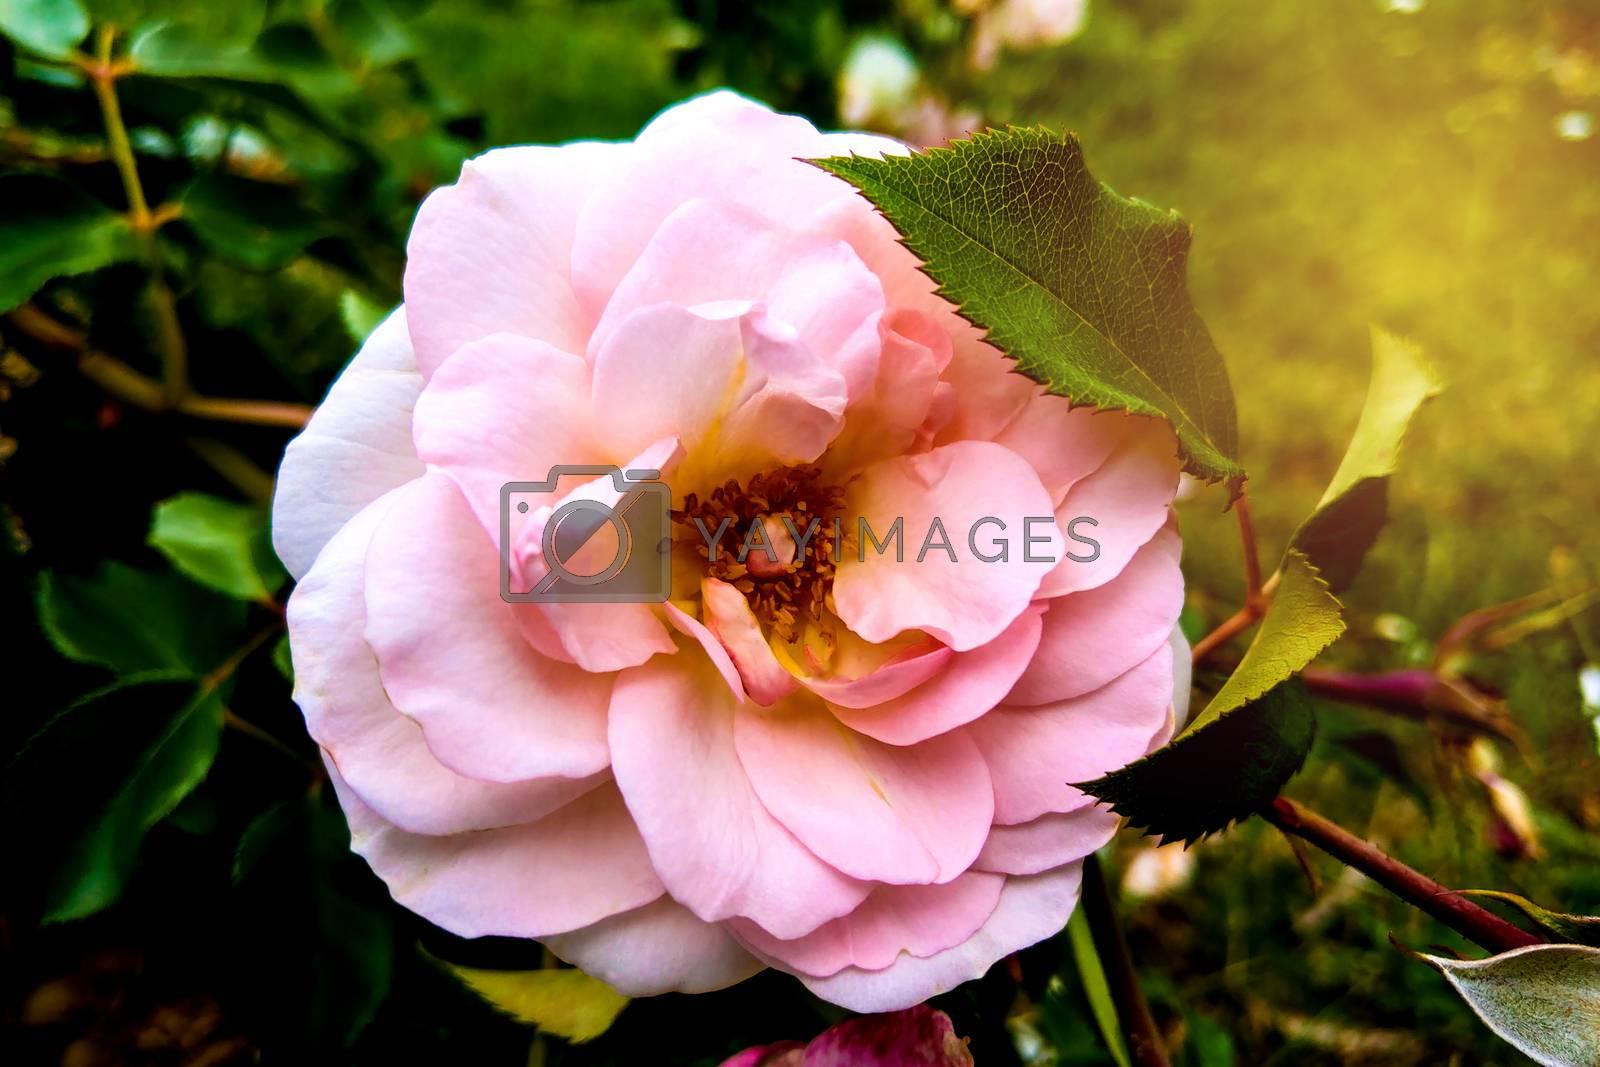 Pink Rose flower bloom on background blurry roses in roses garden. by kip02kas